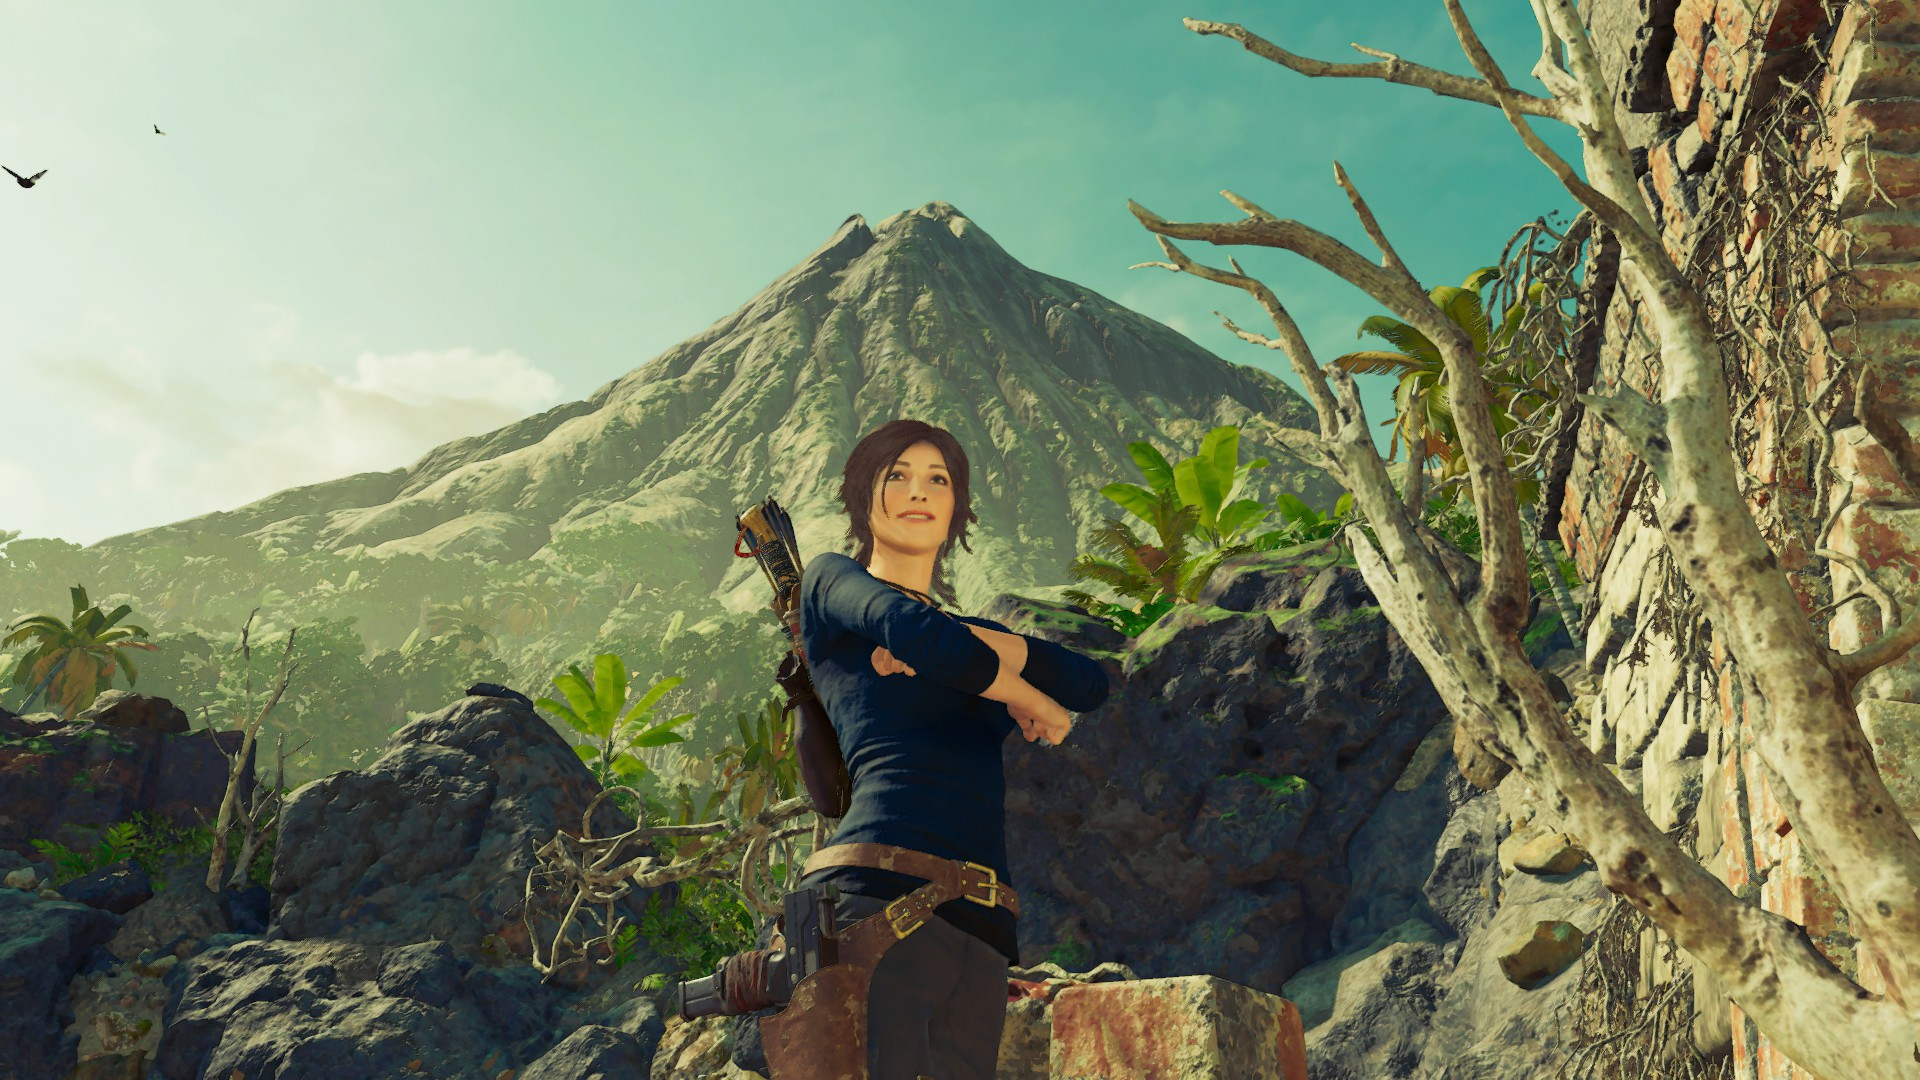 20190406182822_1.jpg - Shadow of the Tomb Raider